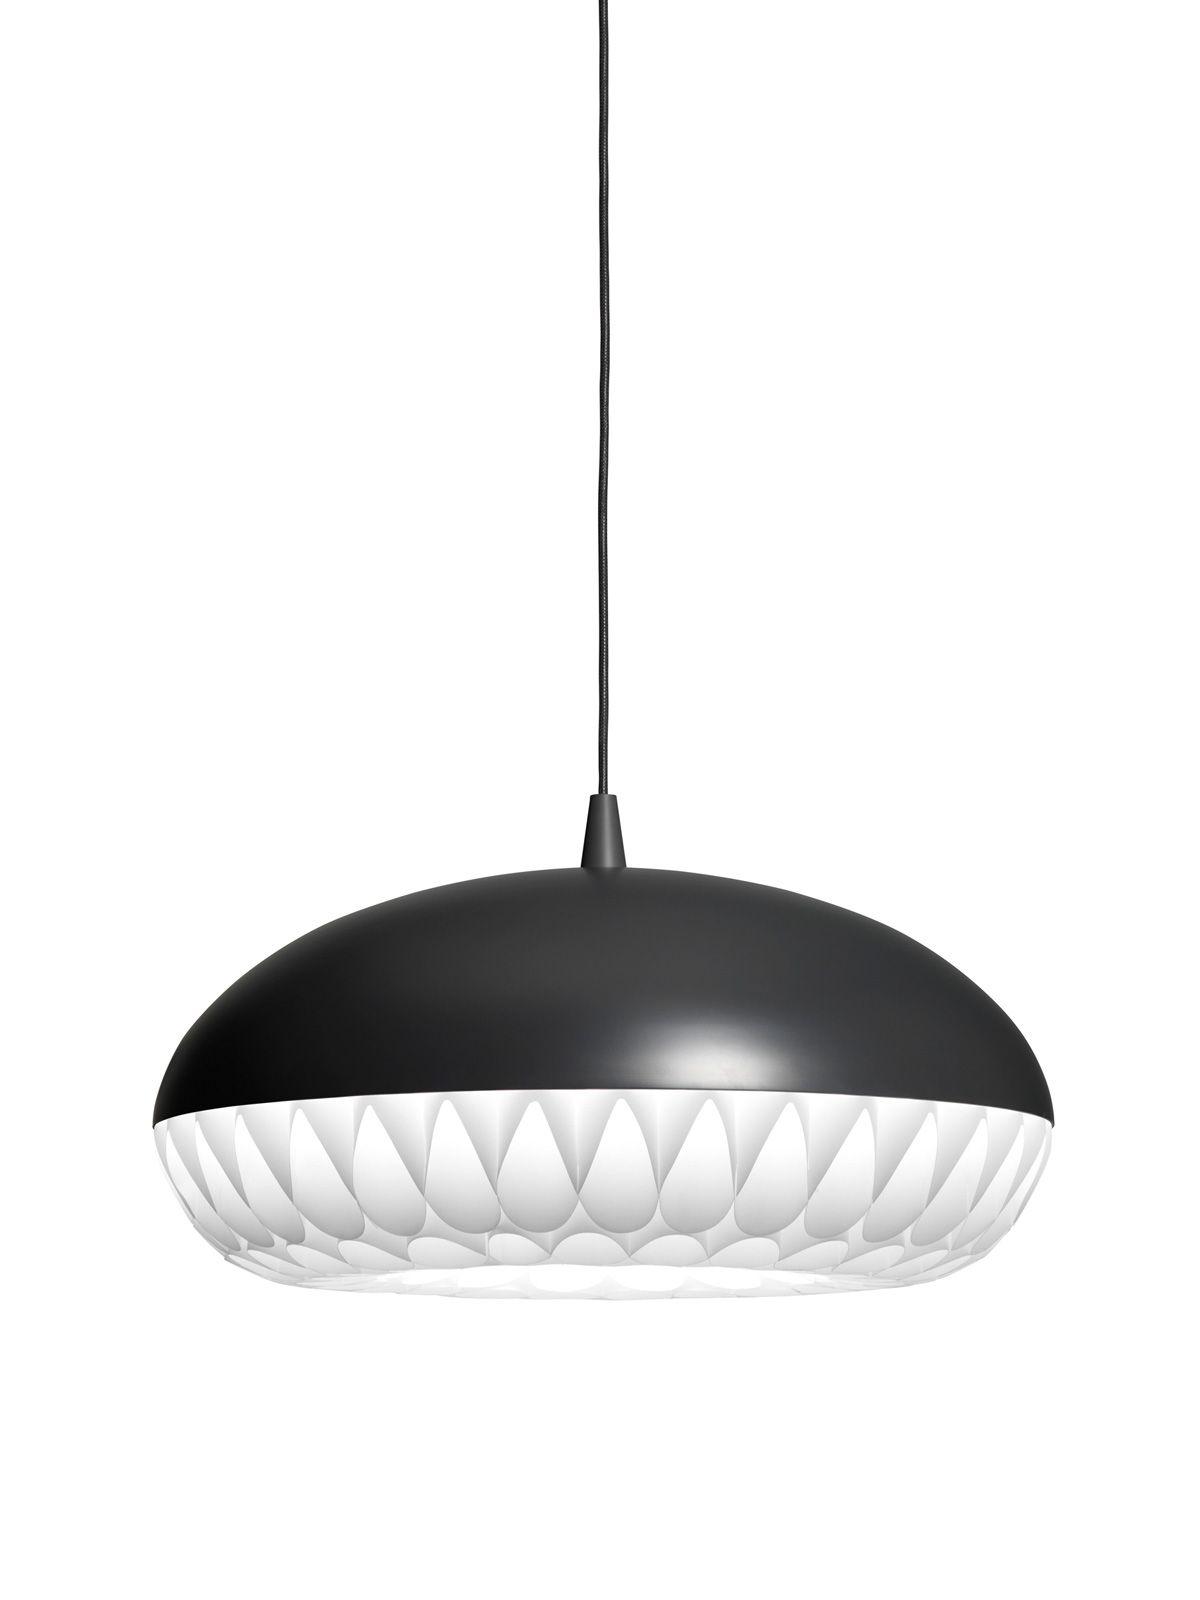 aeon rocket p3 skandinavische design leuchten. Black Bedroom Furniture Sets. Home Design Ideas